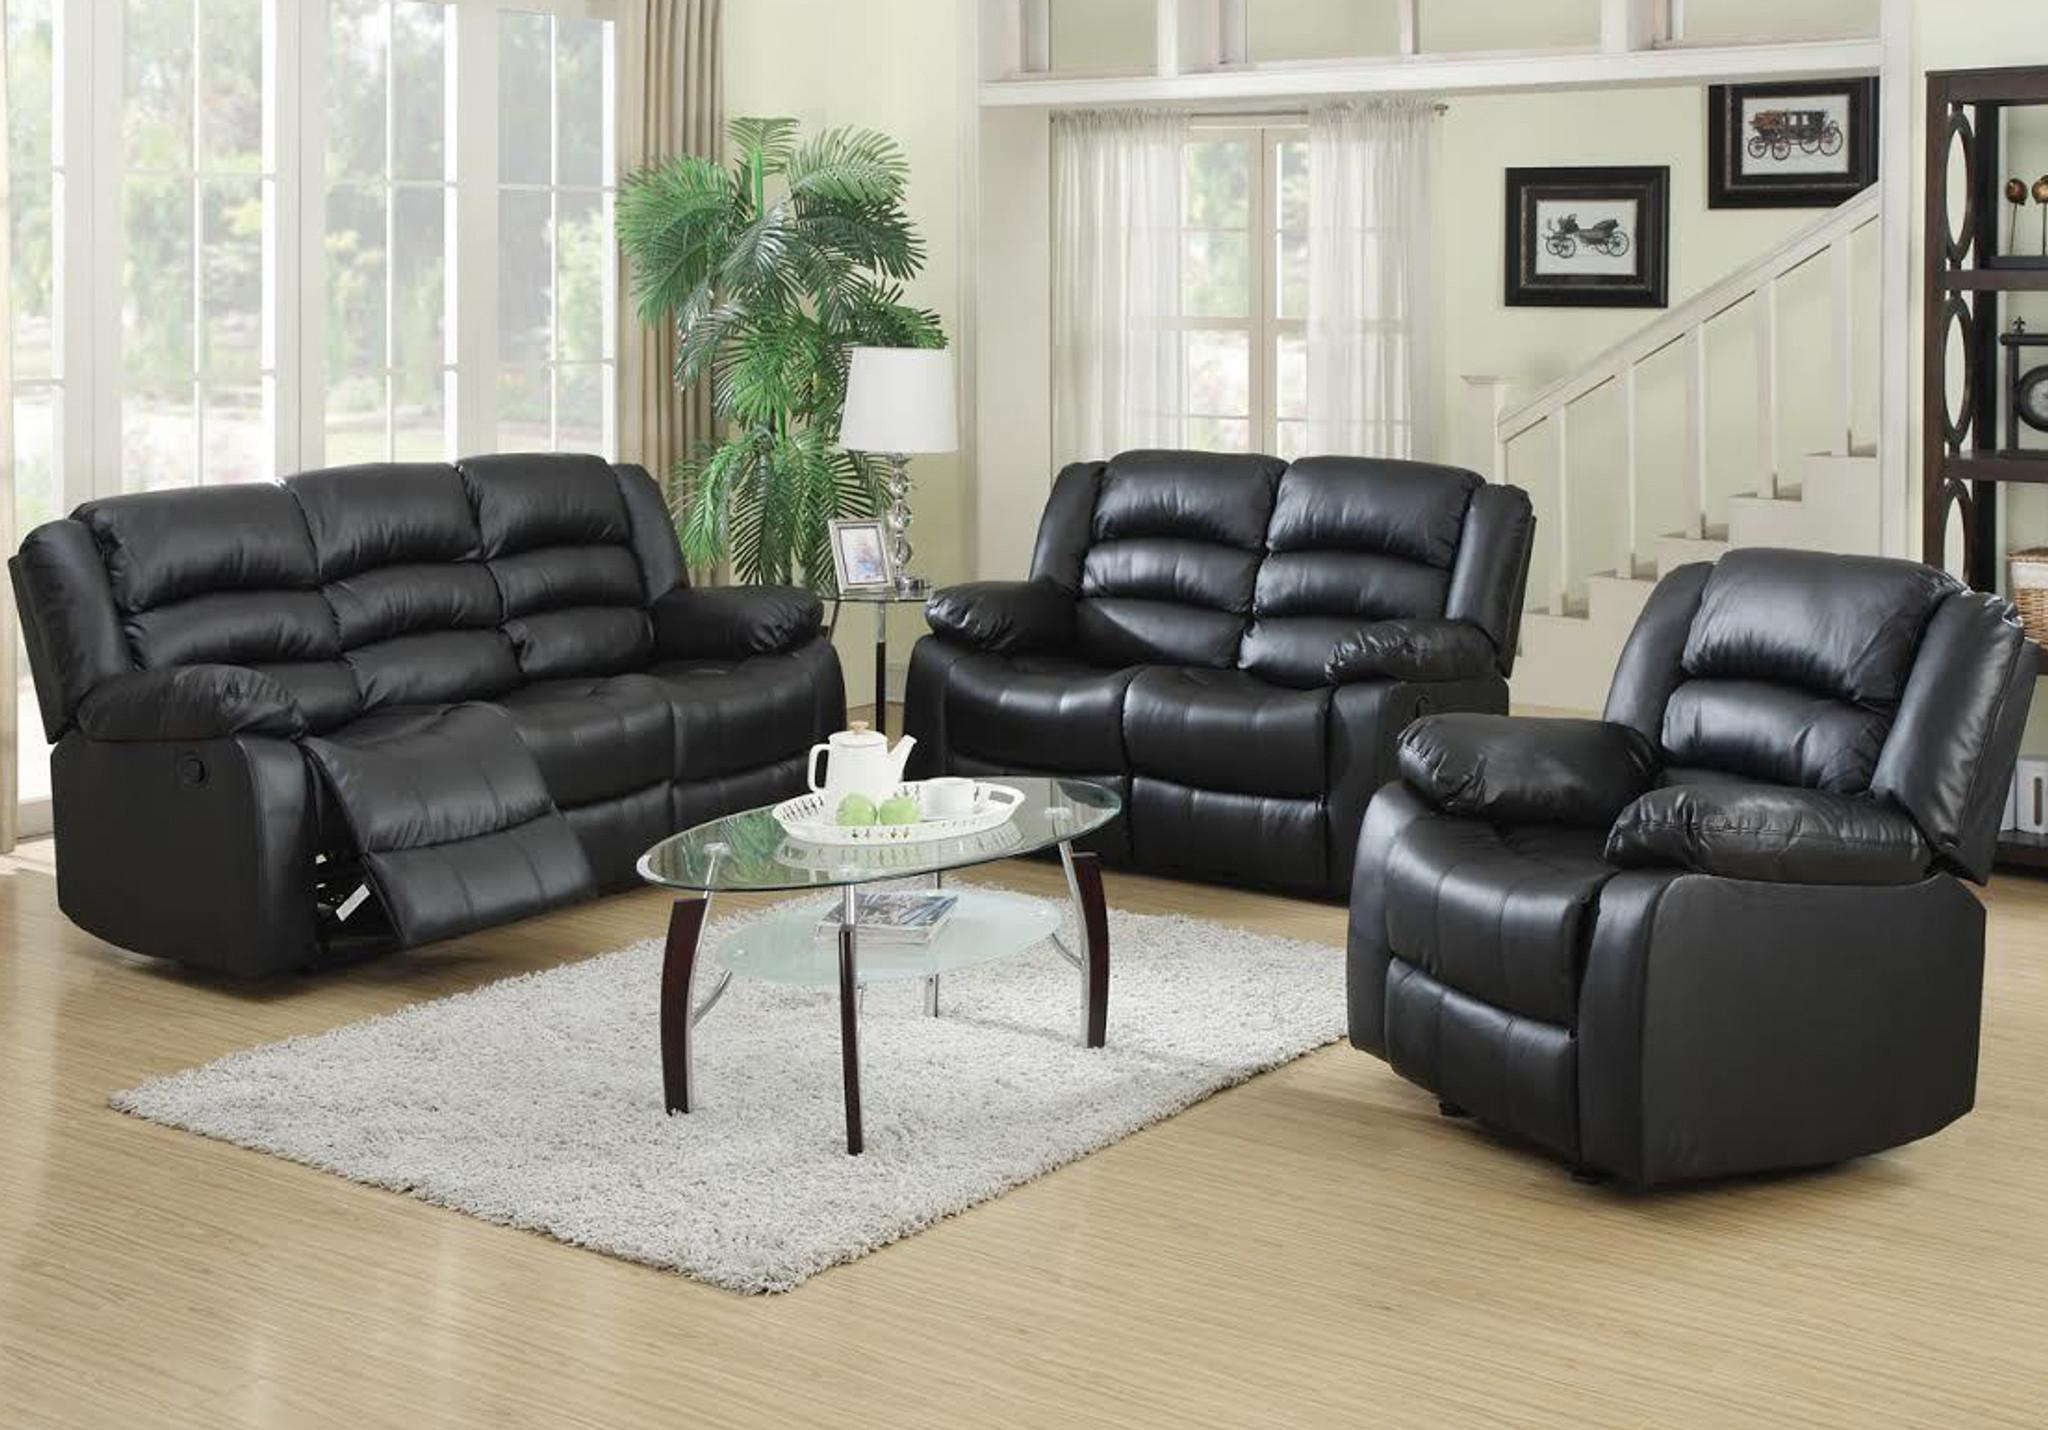 Miraculous Dynamo Black Rocker Sofa And Loveseat 3Pcs Set Andrewgaddart Wooden Chair Designs For Living Room Andrewgaddartcom